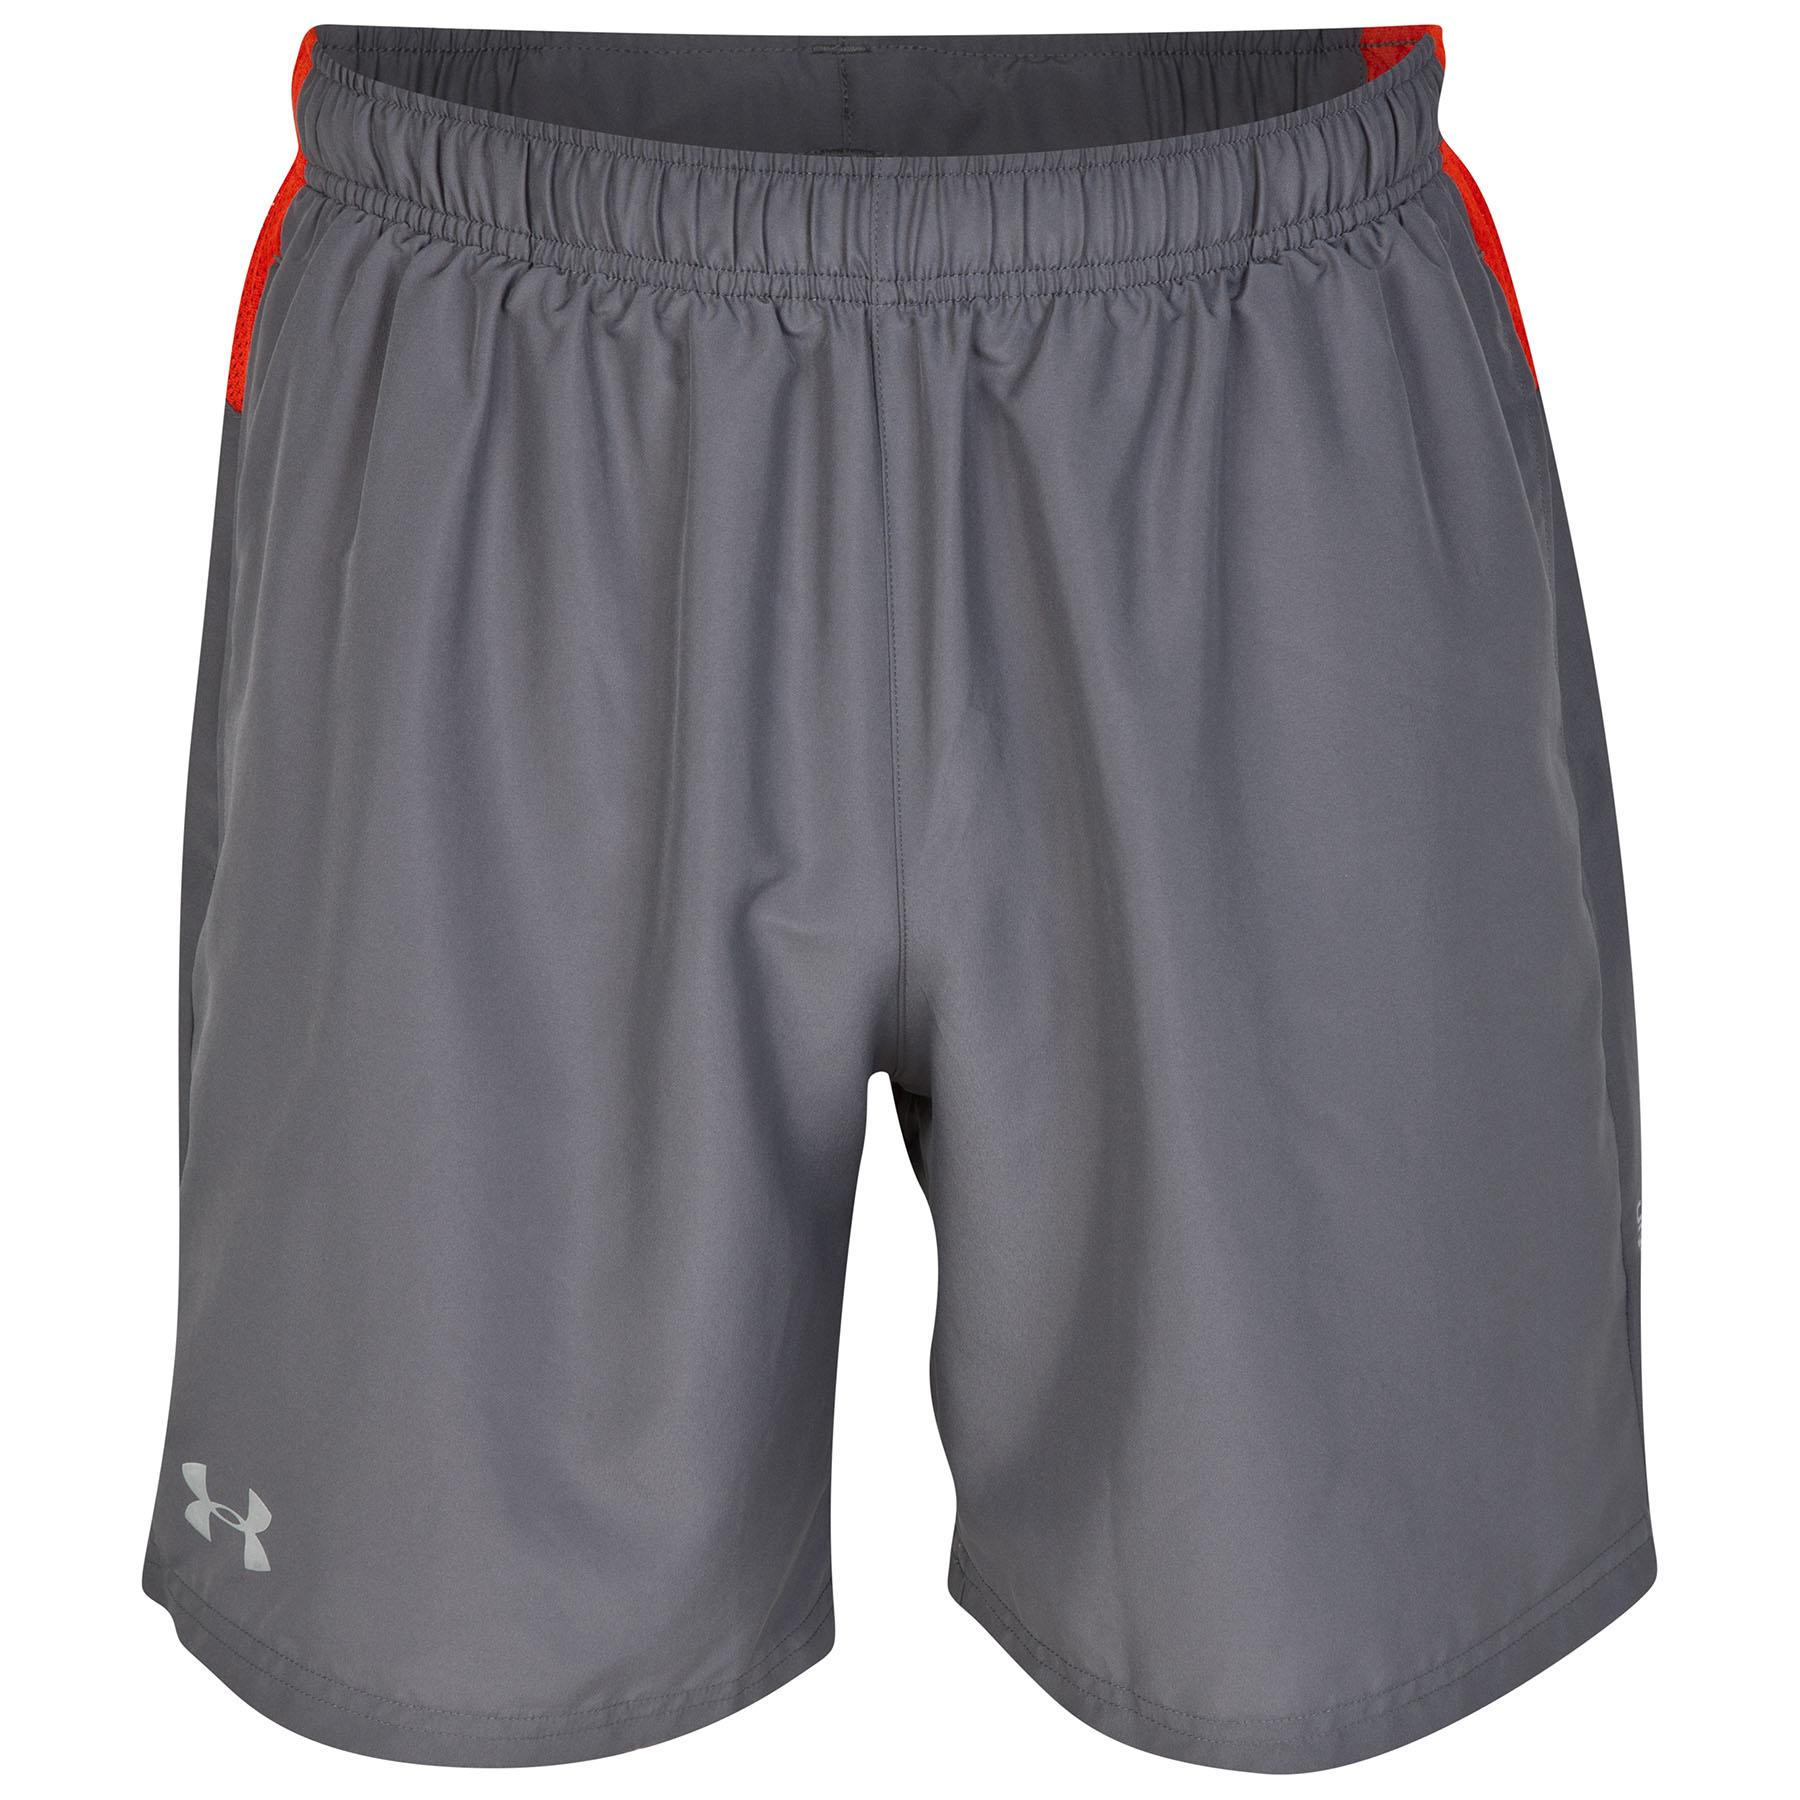 Under Armour Sixth Man 2-in-1 Shorts Lt Grey